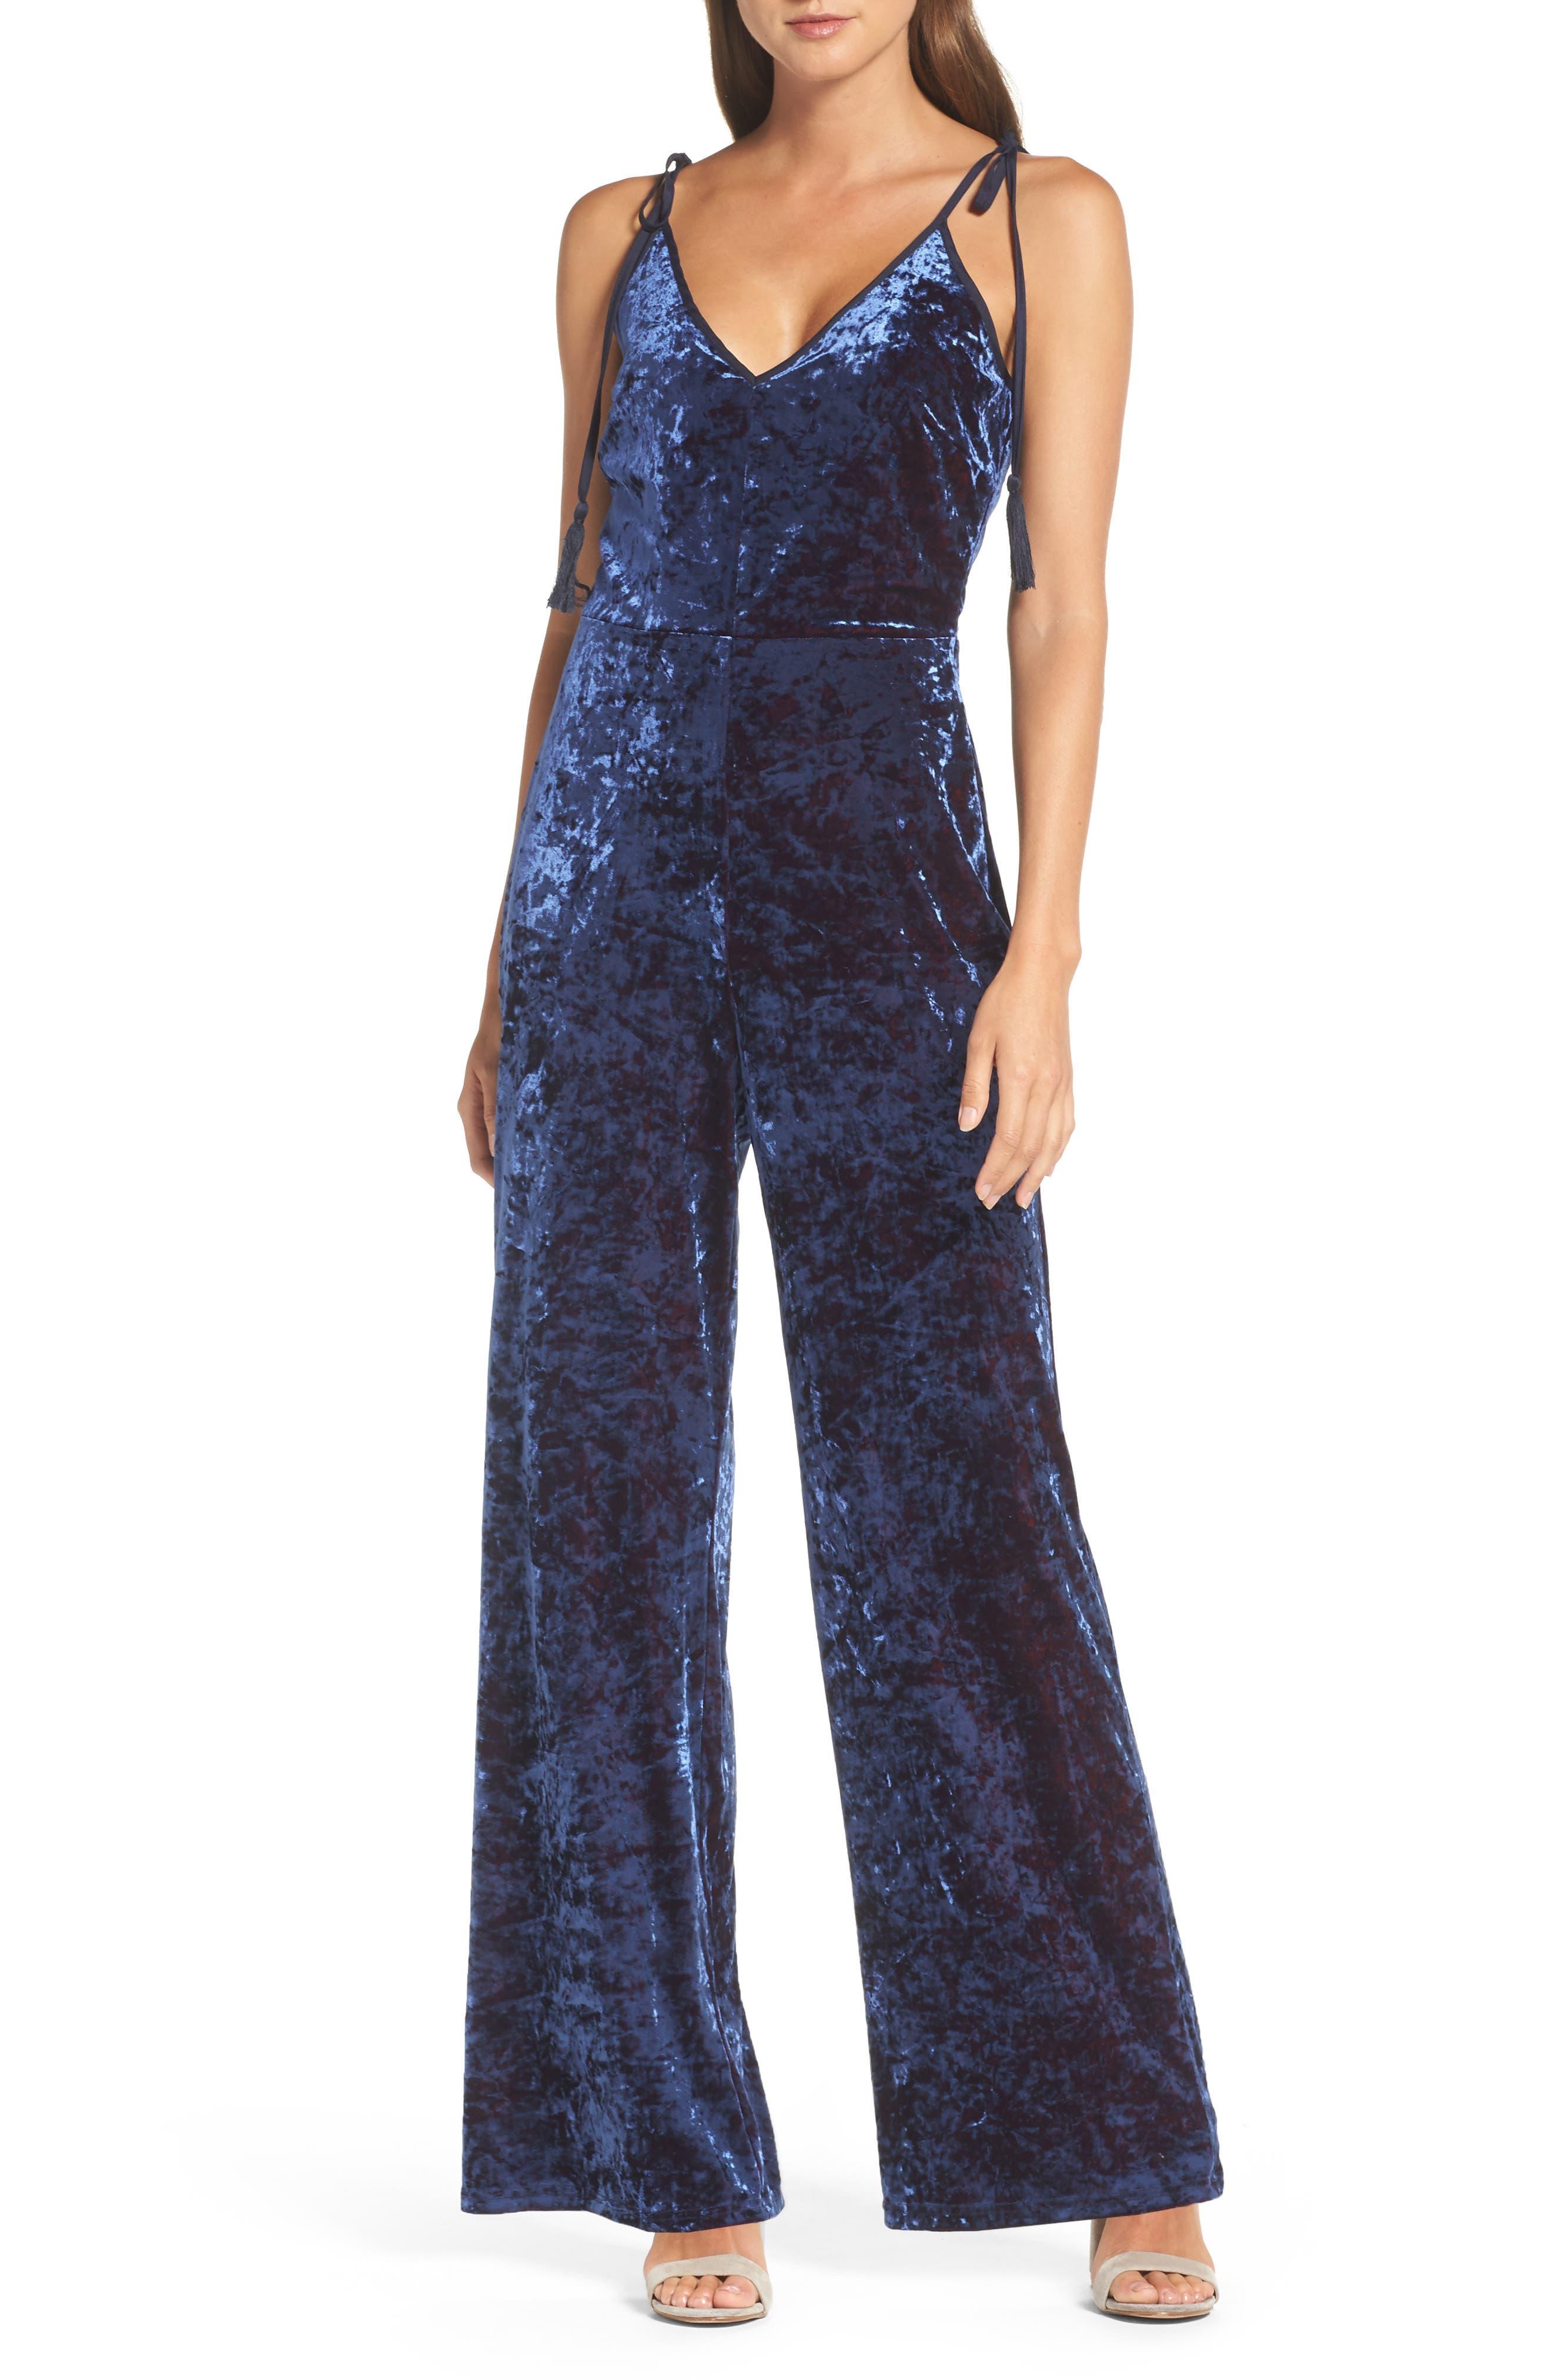 Regina Crushed Velvet Jumpsuit,                             Main thumbnail 1, color,                             410